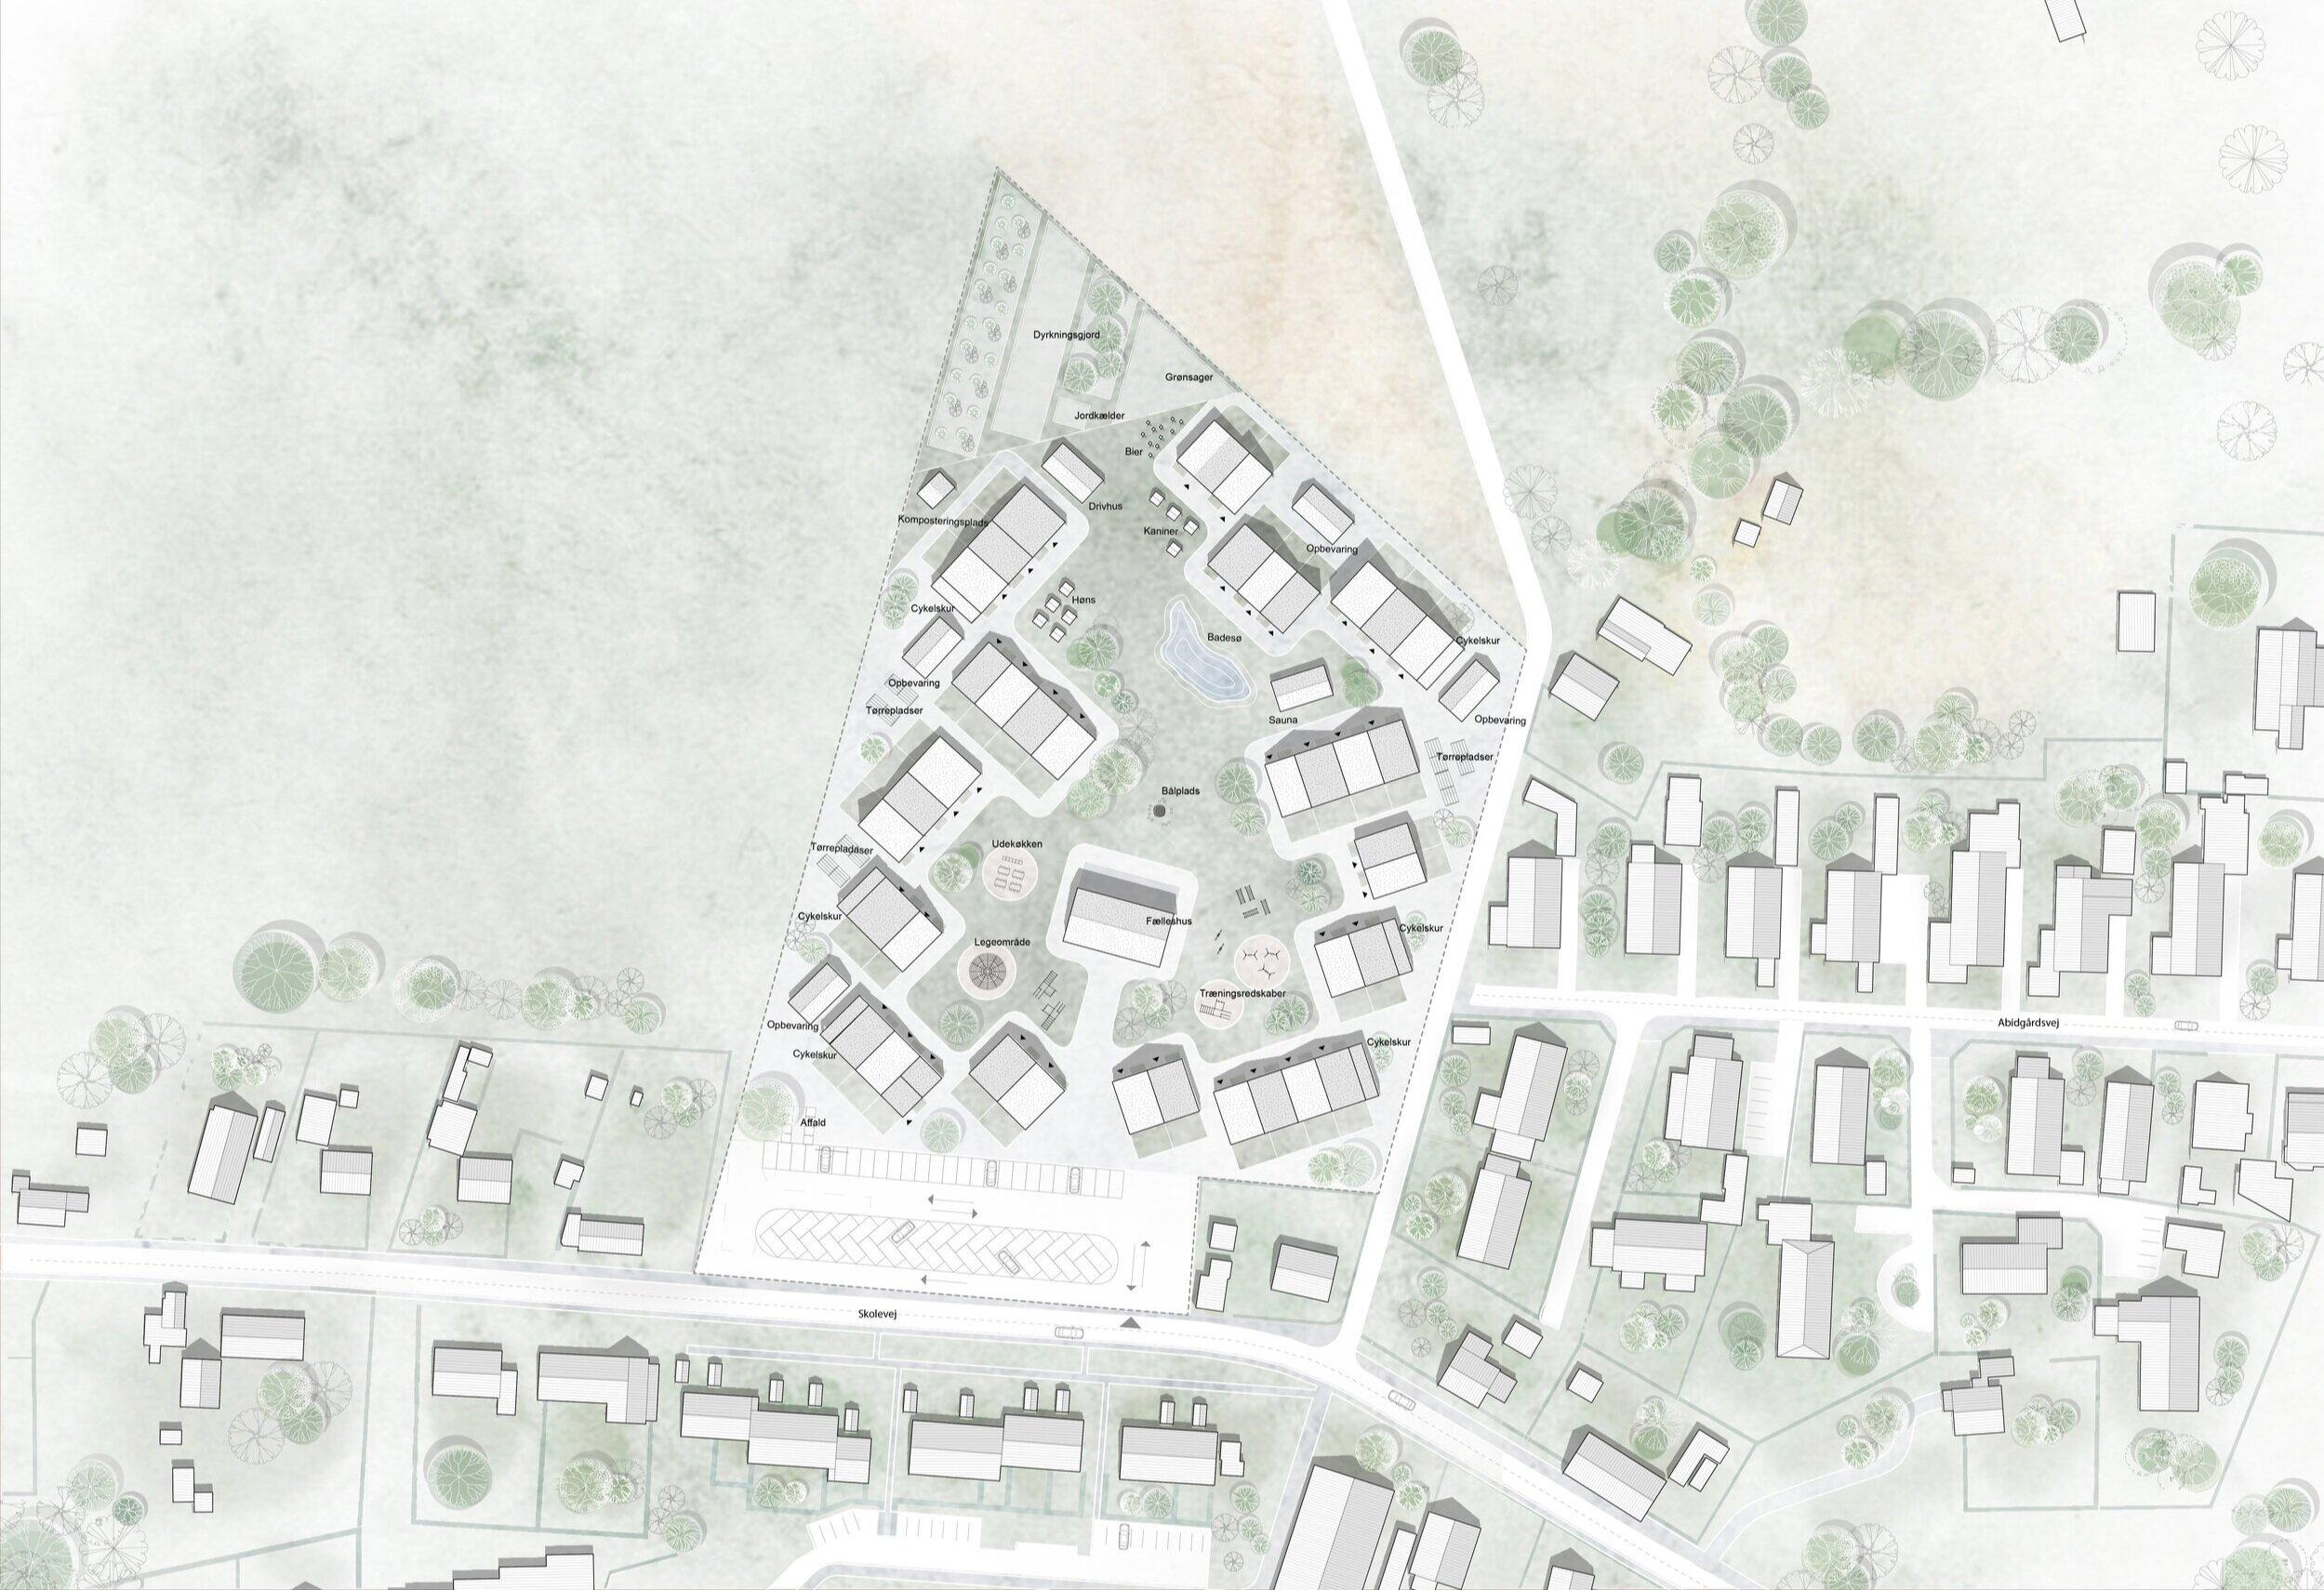 2019_05_20_Site+Plan_A2_1.700-2-01.jpg